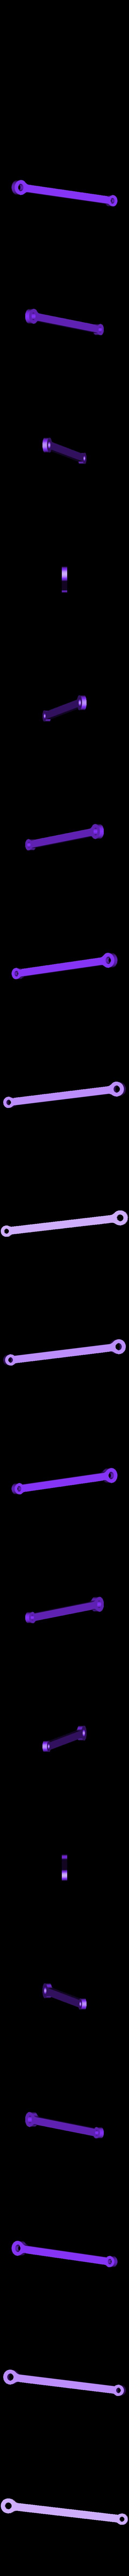 brake_motor_connecting_rod.STL Download free STL file 4-8-8-4 Big Boy Locomotive • 3D printer object, RaymondDeLuca